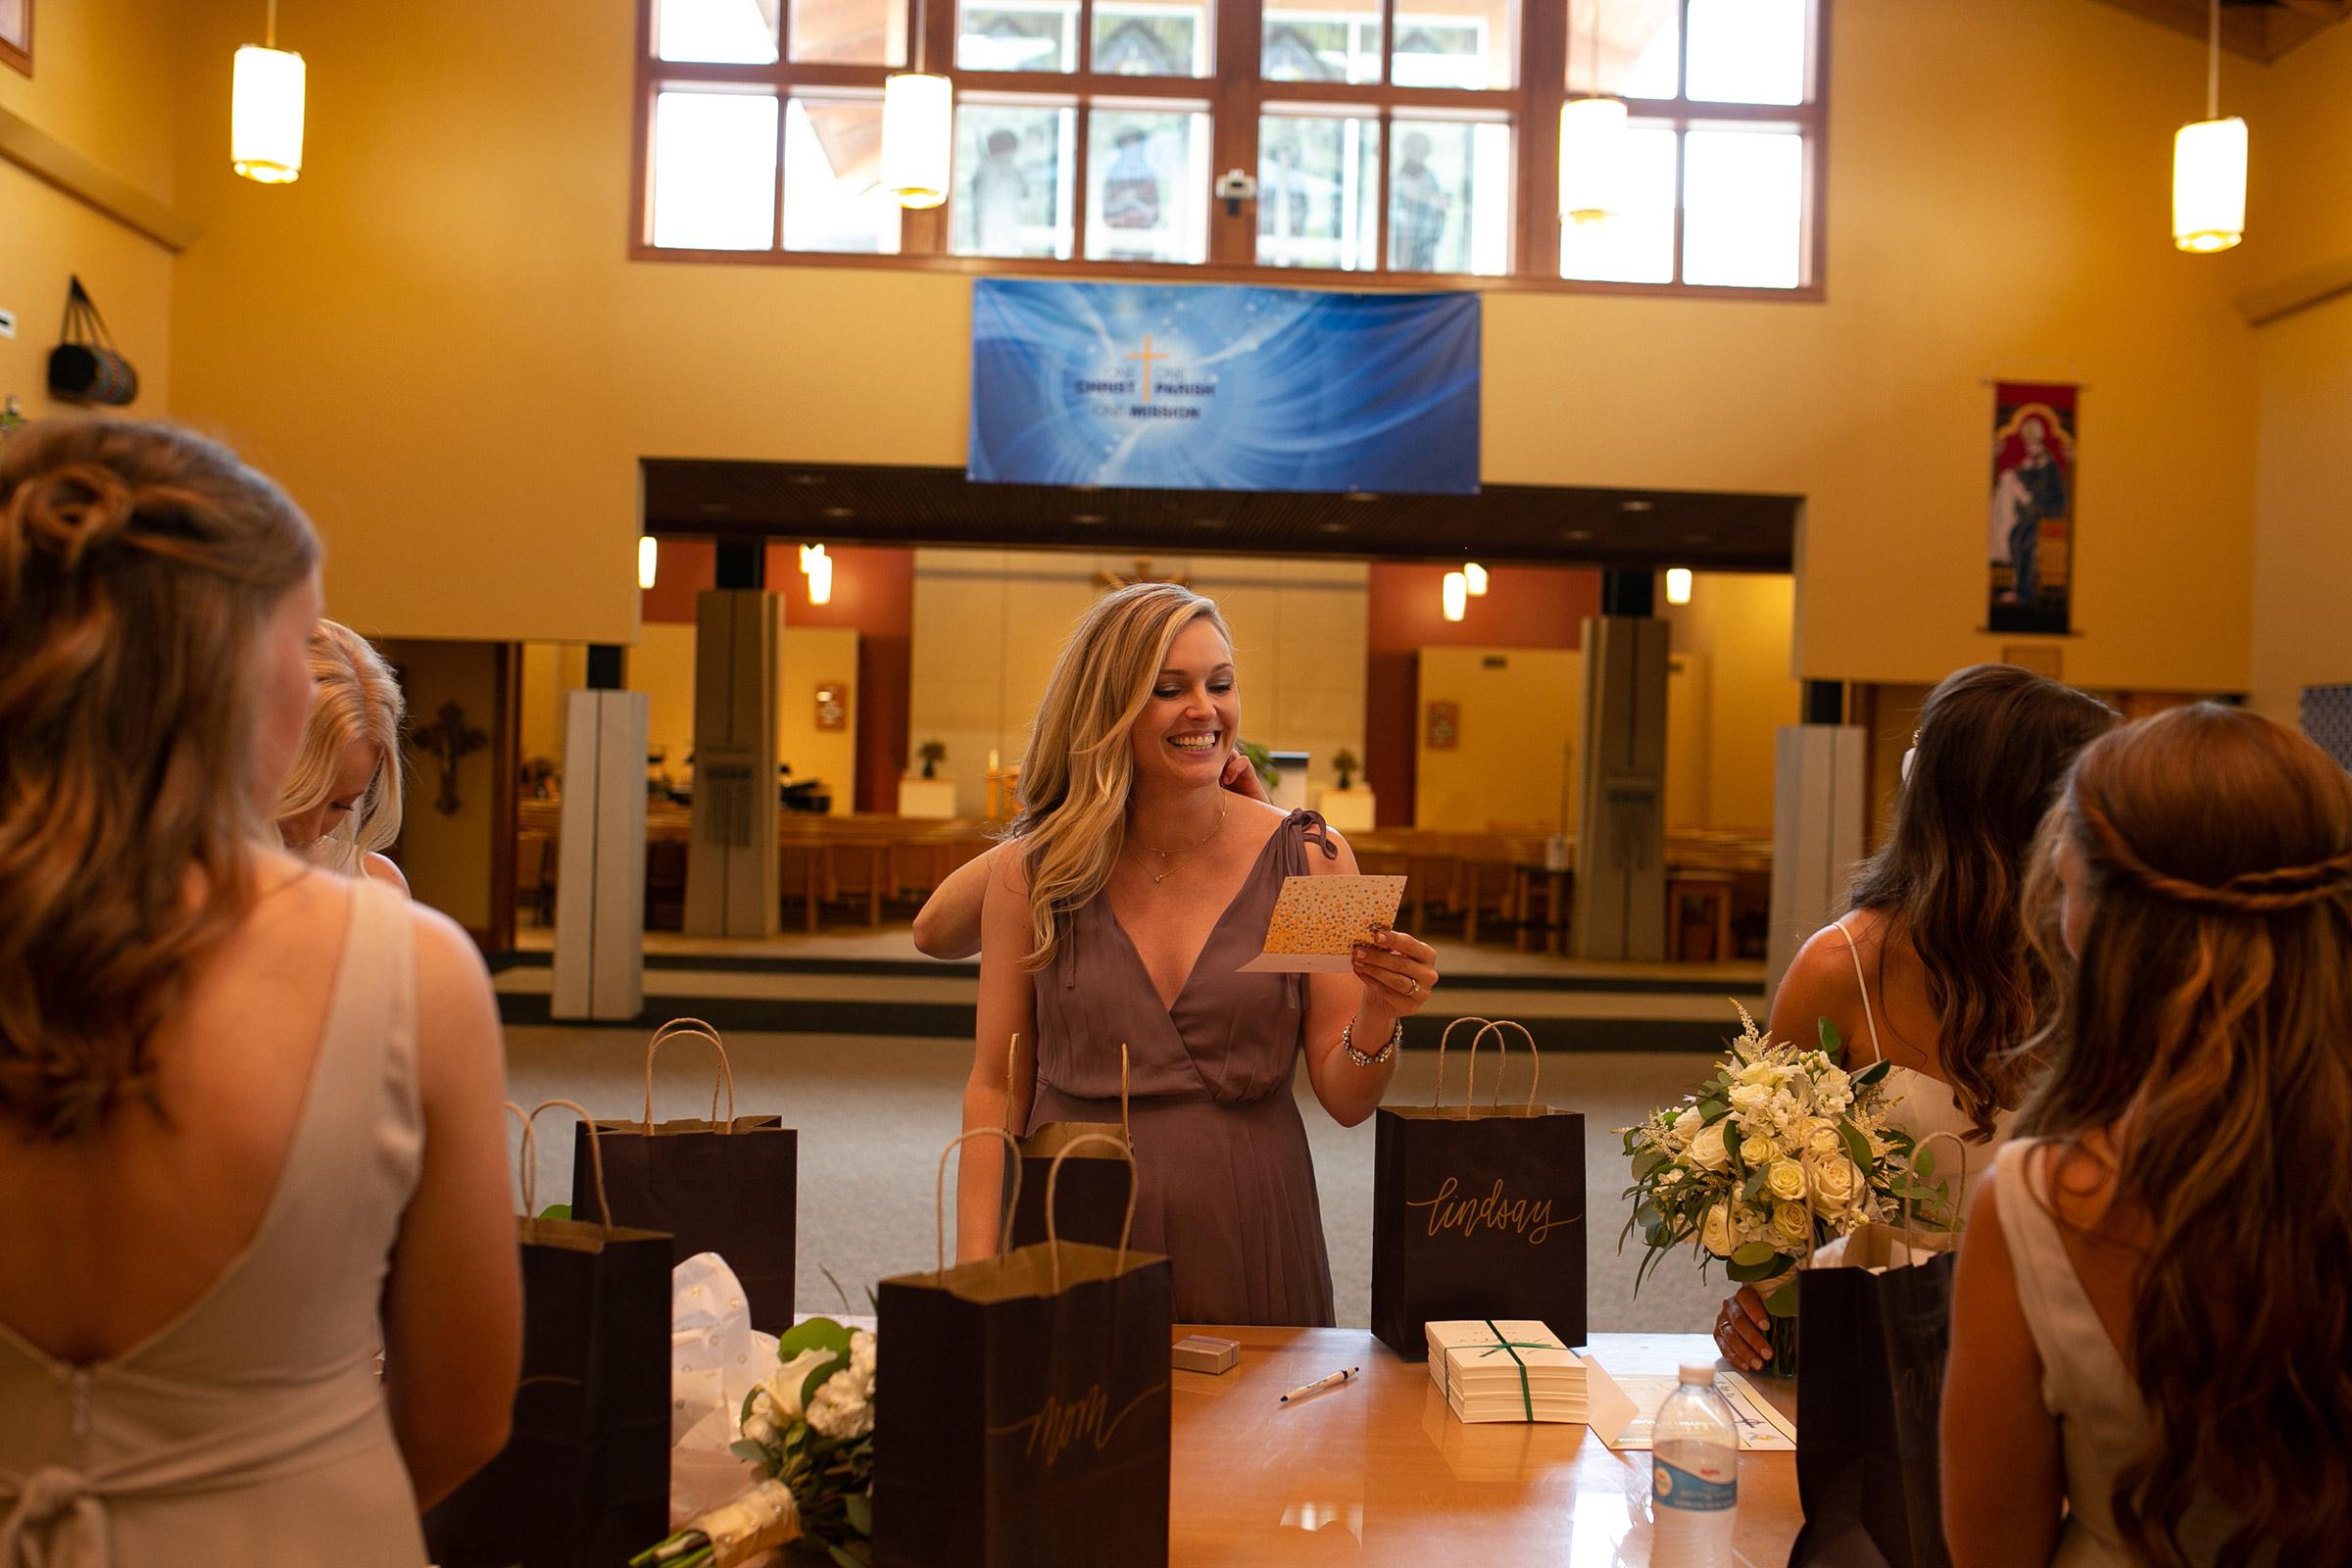 mr-mrs-hull-bridesmaid-opening-gifts-st-boniface-church-waukee-desmoines-iowa-raelyn-ramey-photography-198.jpg